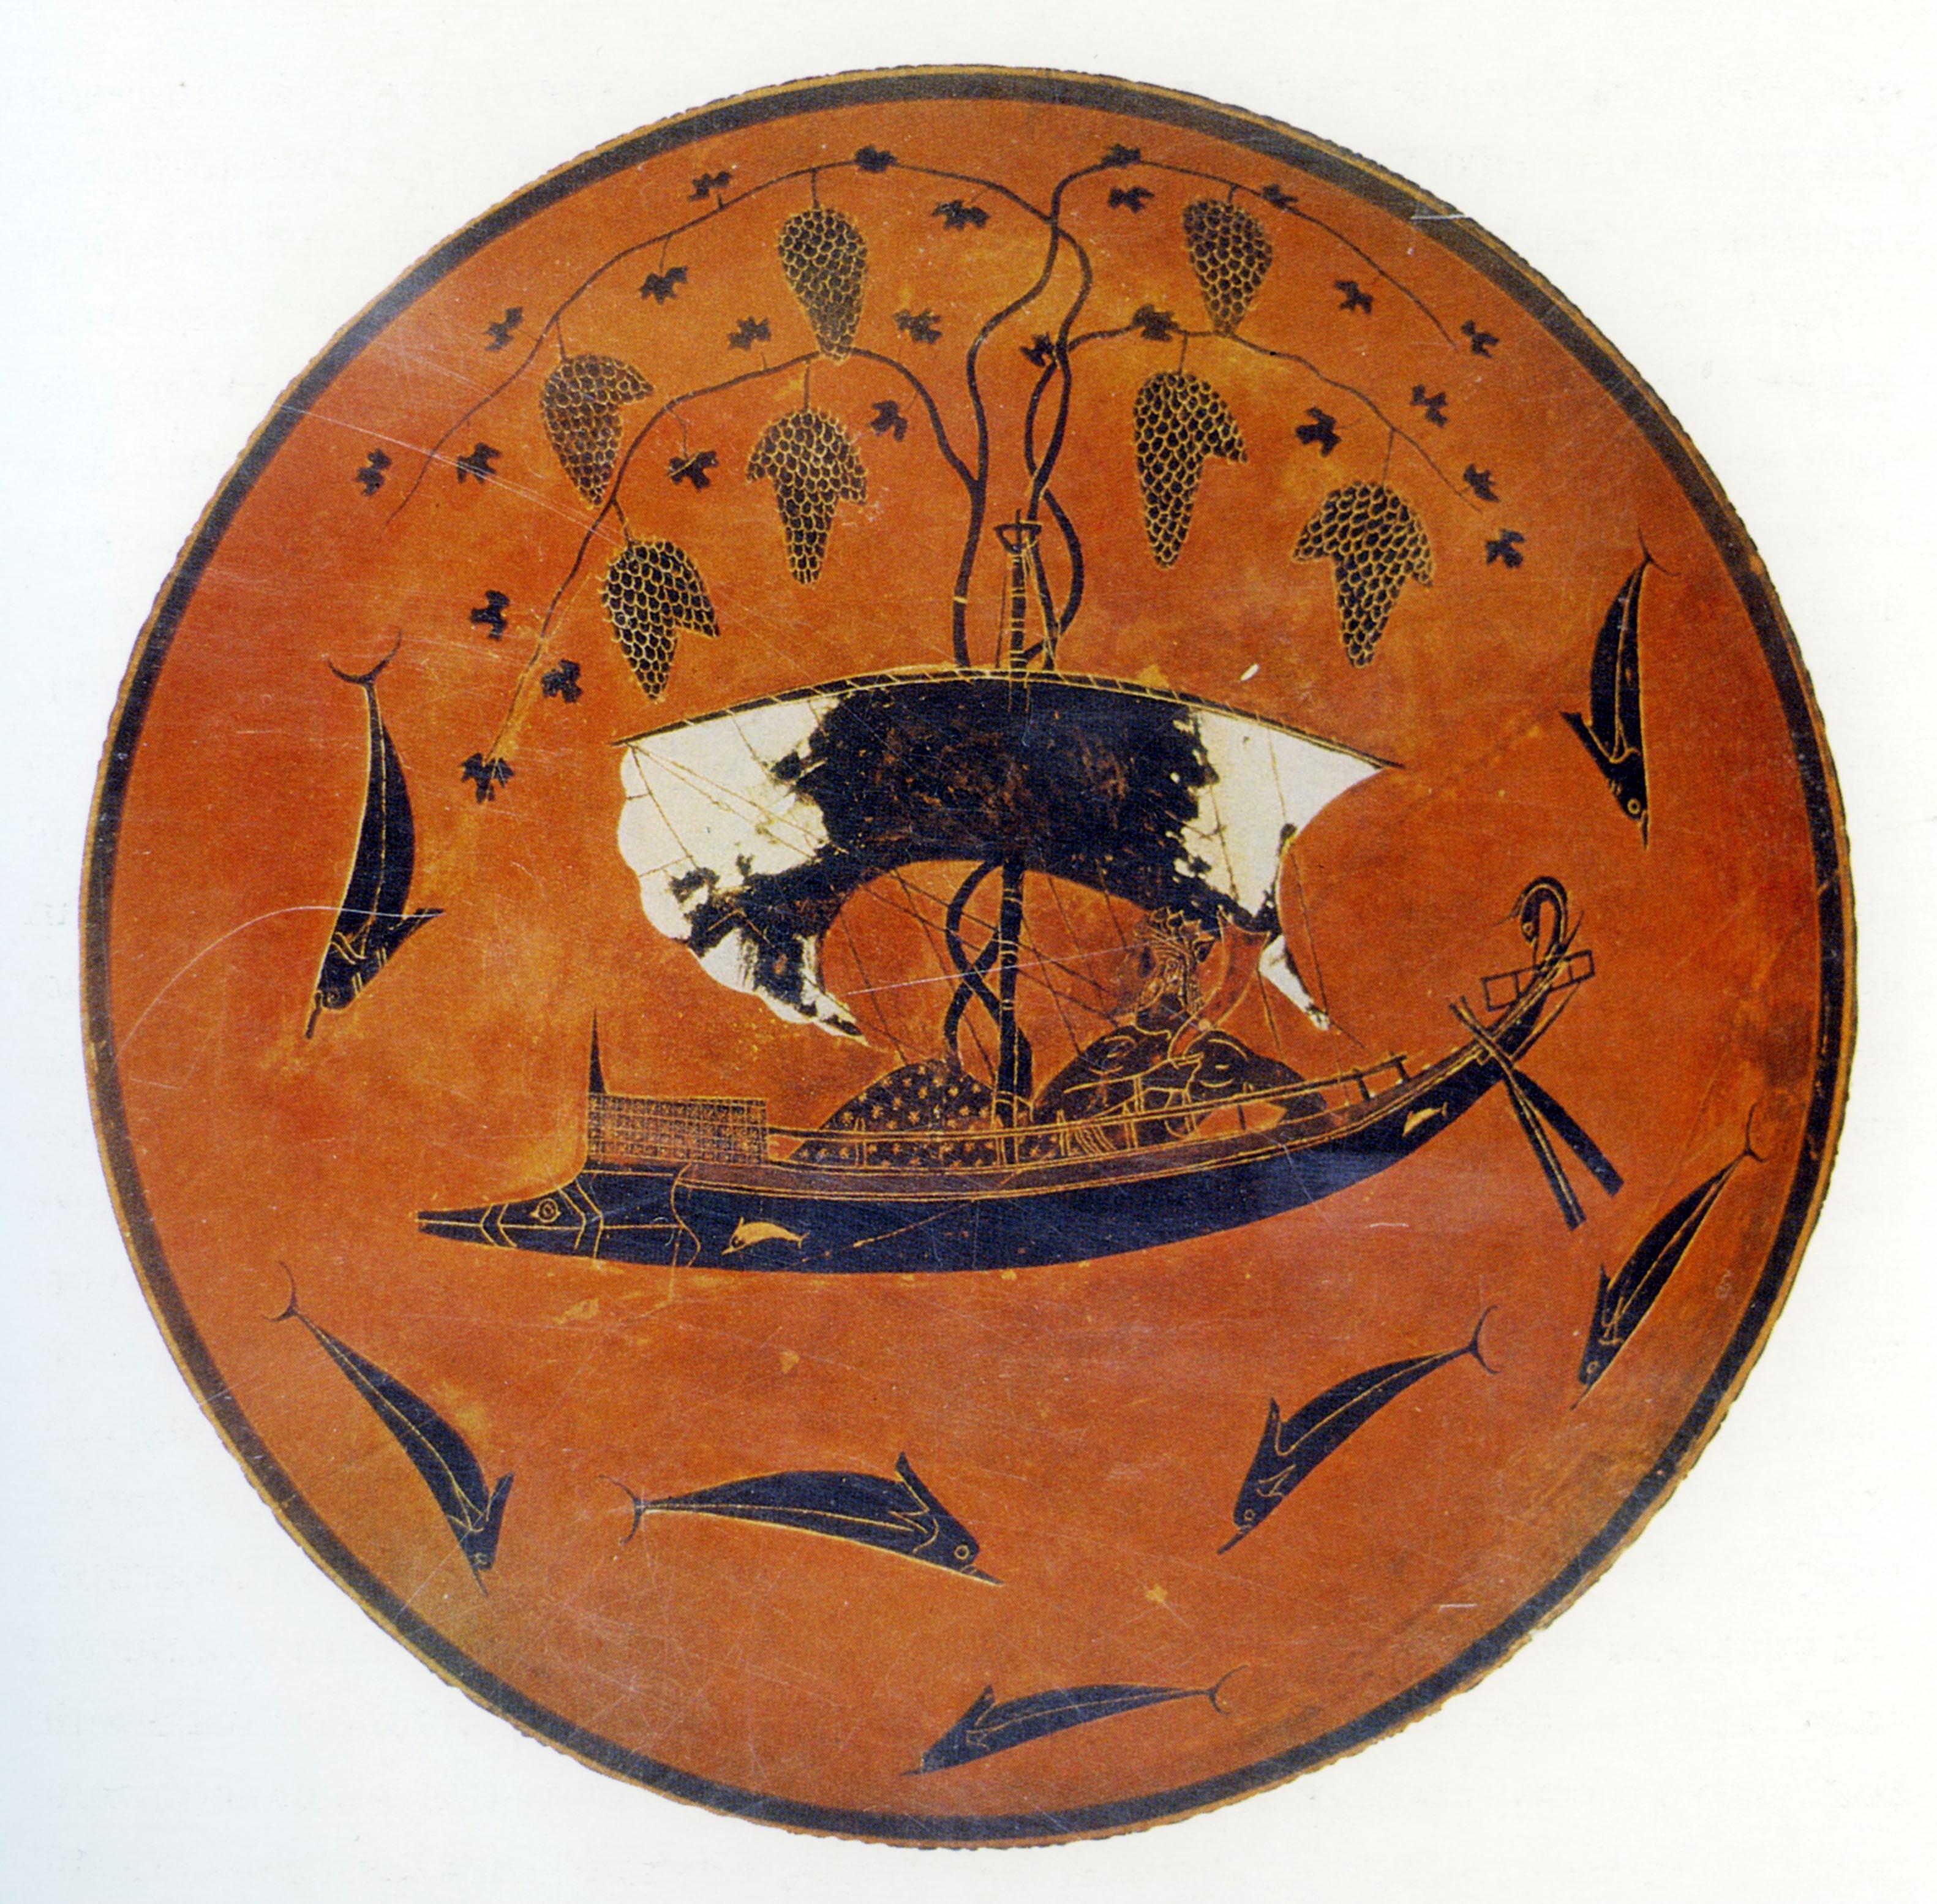 Dioniso Attraversa Il Mare Kylix Da Vulci, 540 A.C. Circa (Monaco, Staatliche Antikensammlungen)